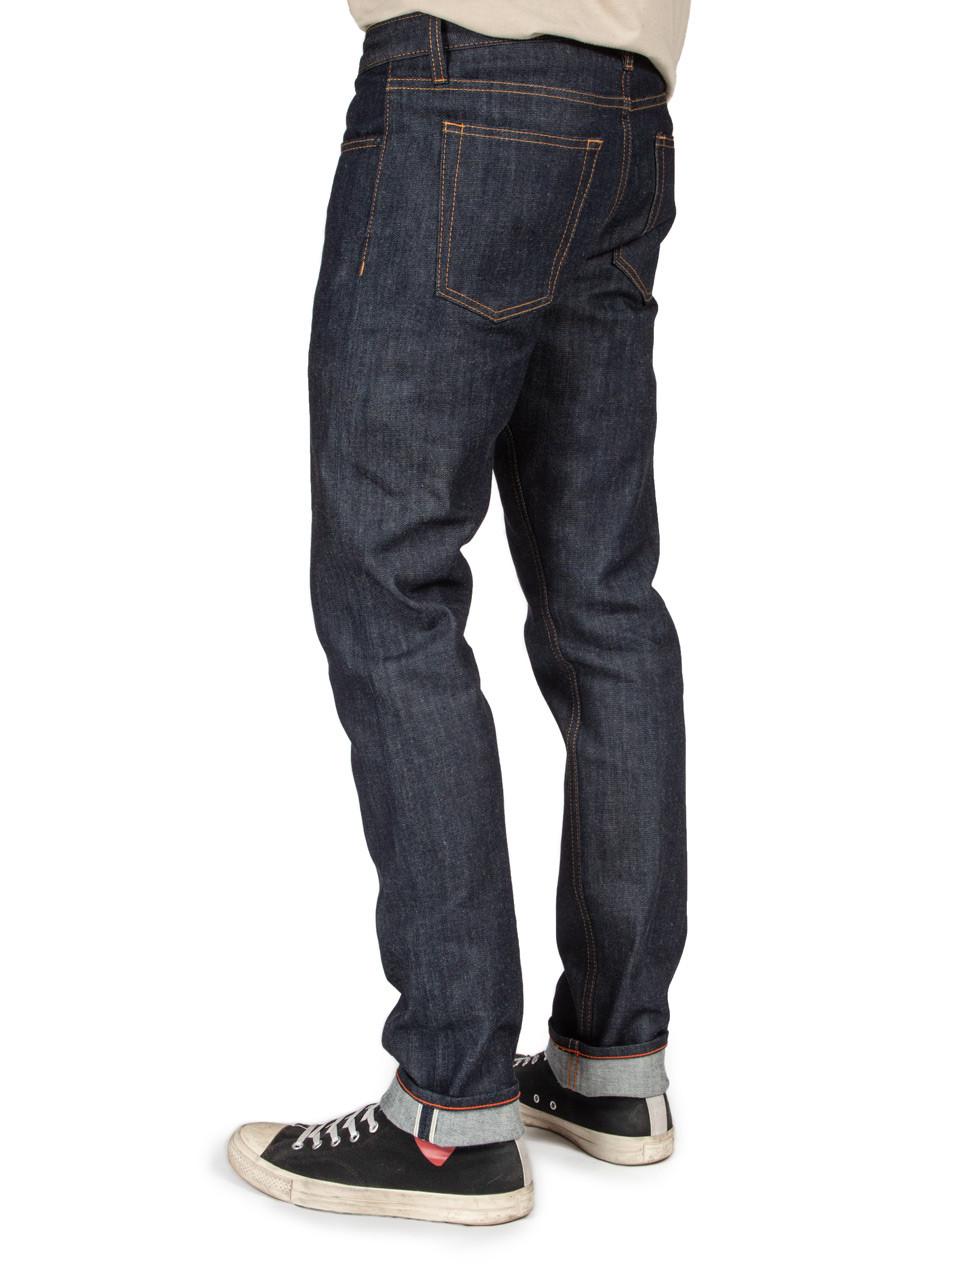 4a46161ac97734 Williamsburg stretch selvedge slim fit raw denim jeans made in USA with  Cone White Oak fabric